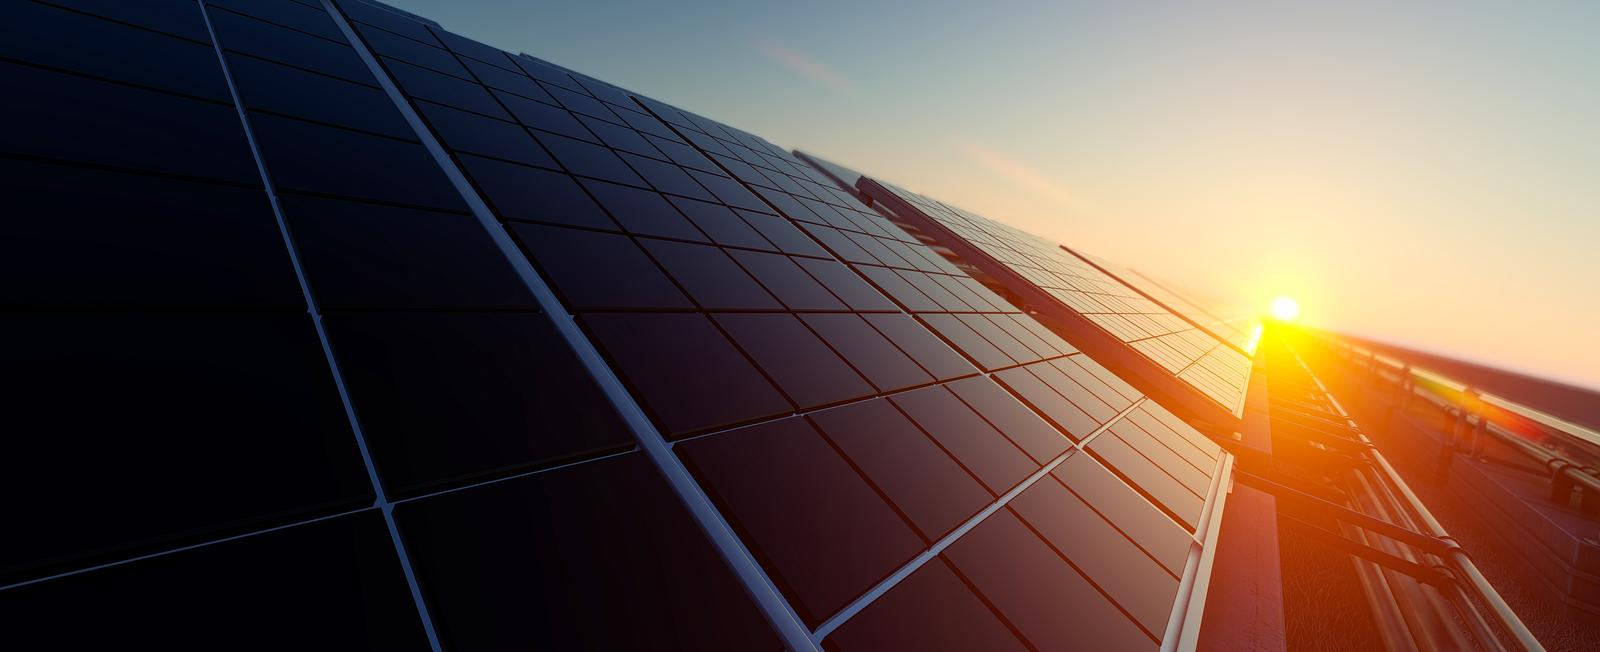 sun setting on black solar panel system